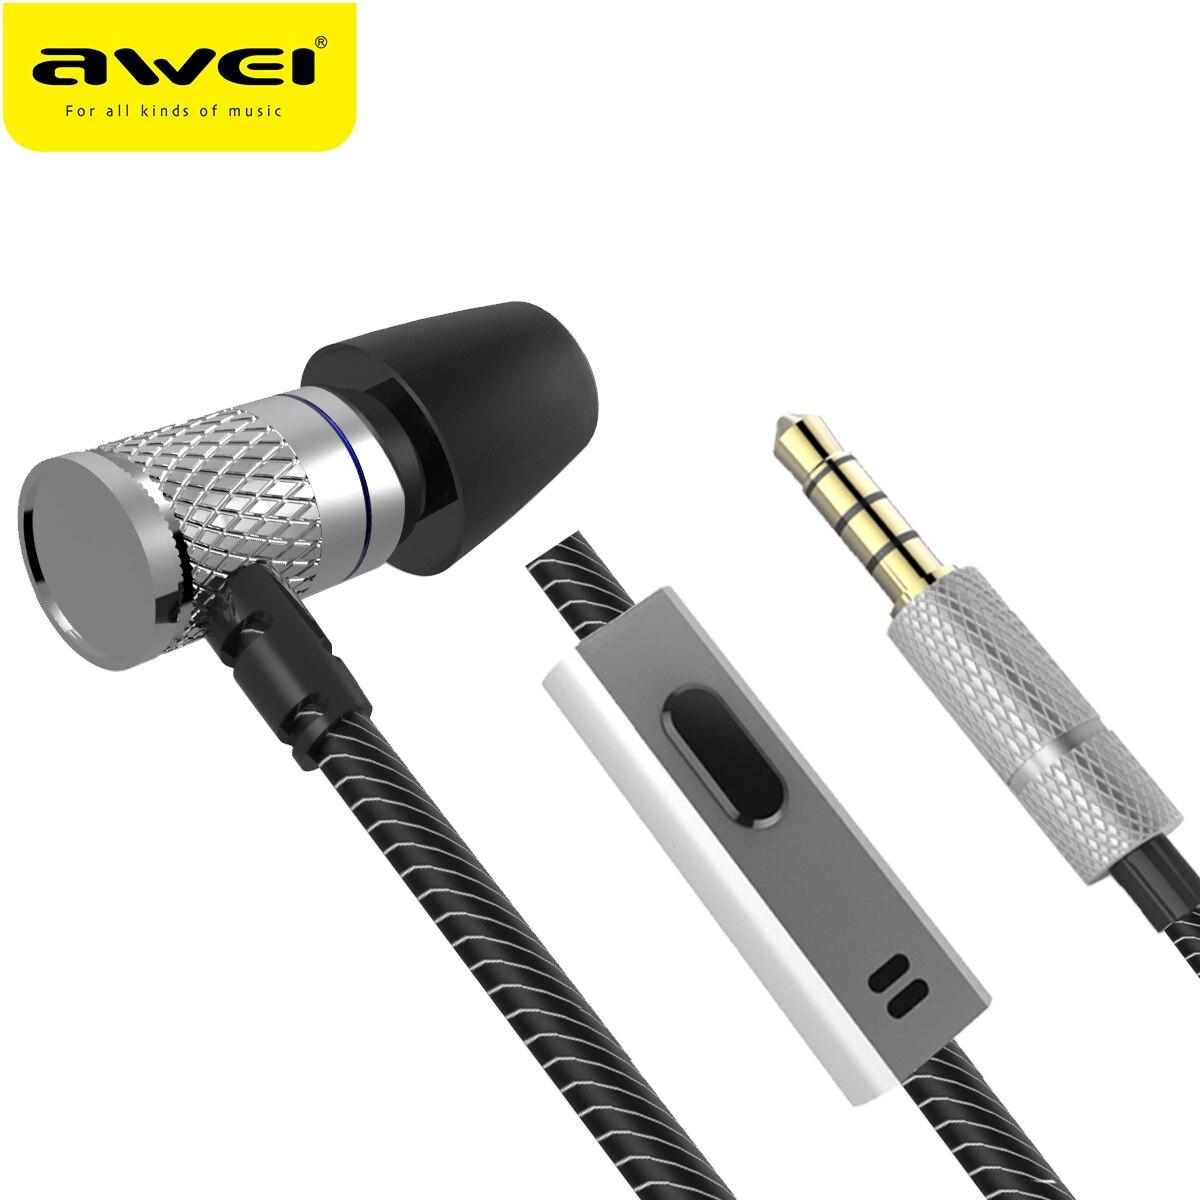 AWEI ES-660I mini Earphone With Microphone Metal Headset HIFI fone de ouvido Audifonos Casque For iPhone Samsung Huawei Phones